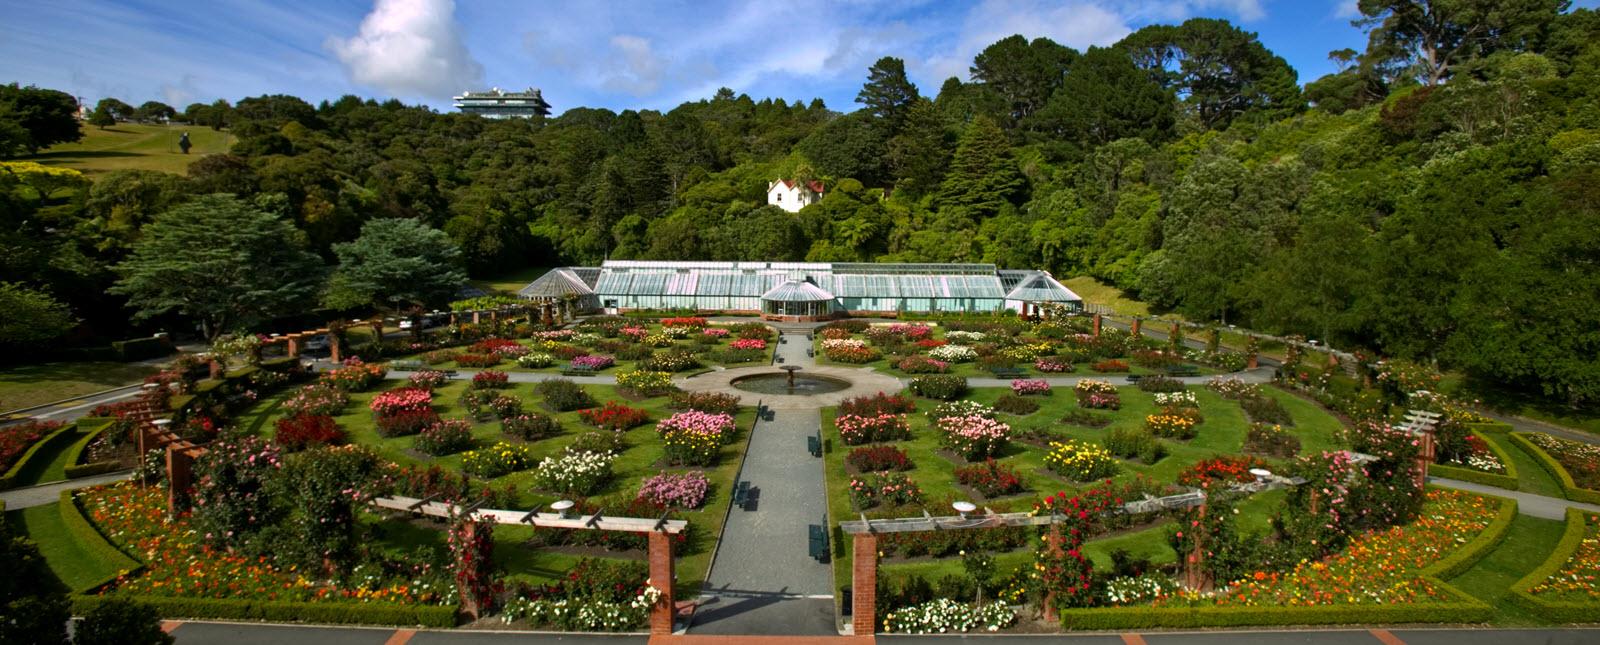 Botanic-Garden-Lady-Norwood-Rose-Garden-1600x645.jpg